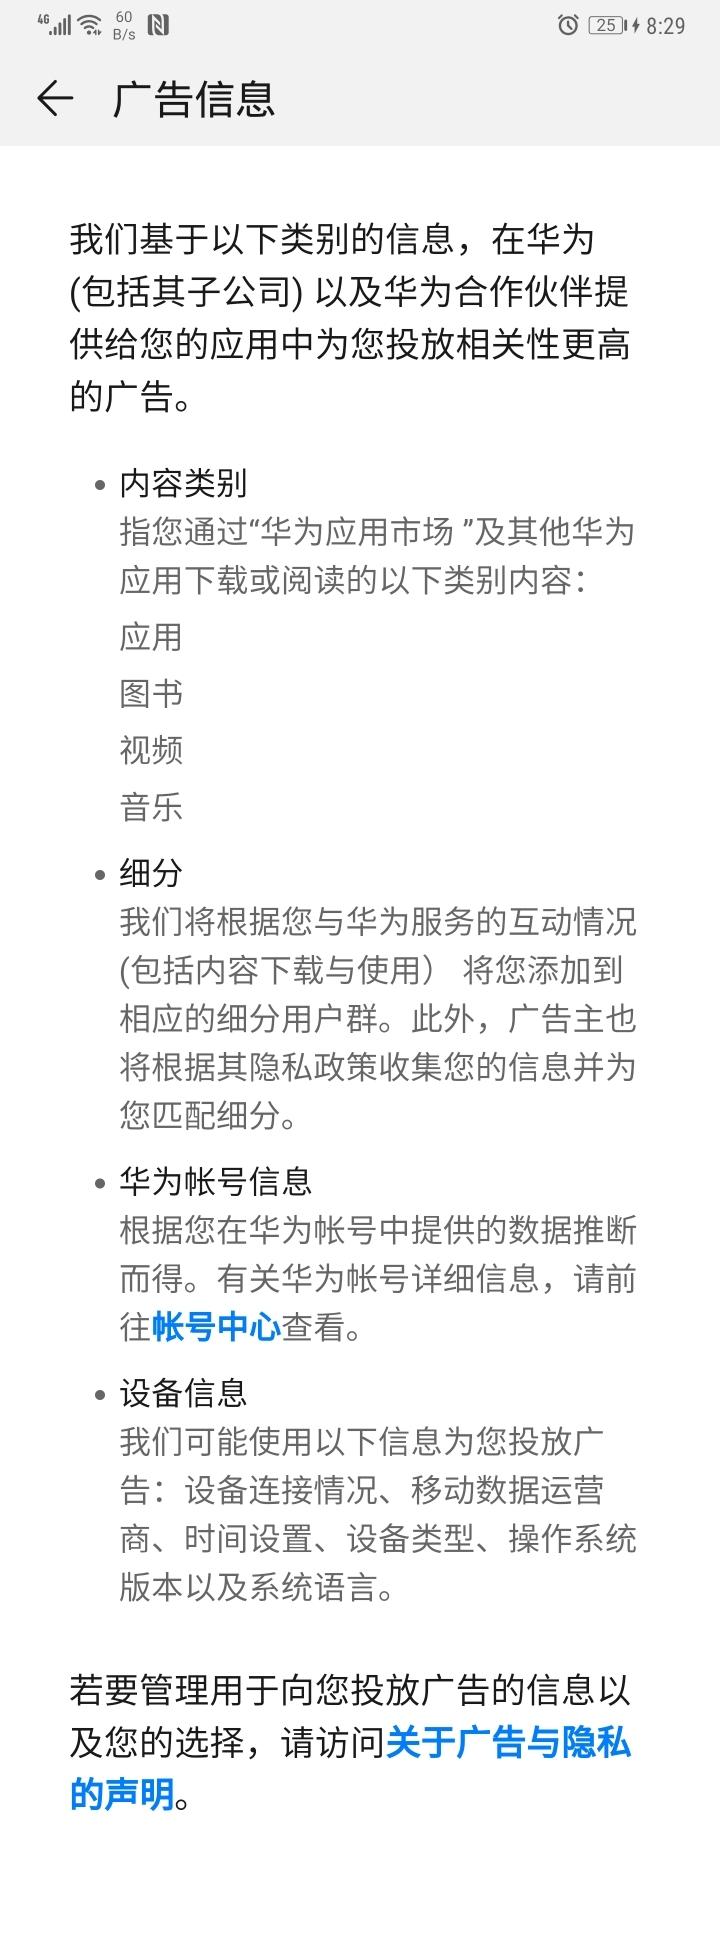 Screenshot_20190812_202939_com.huawei.hwid.jpg